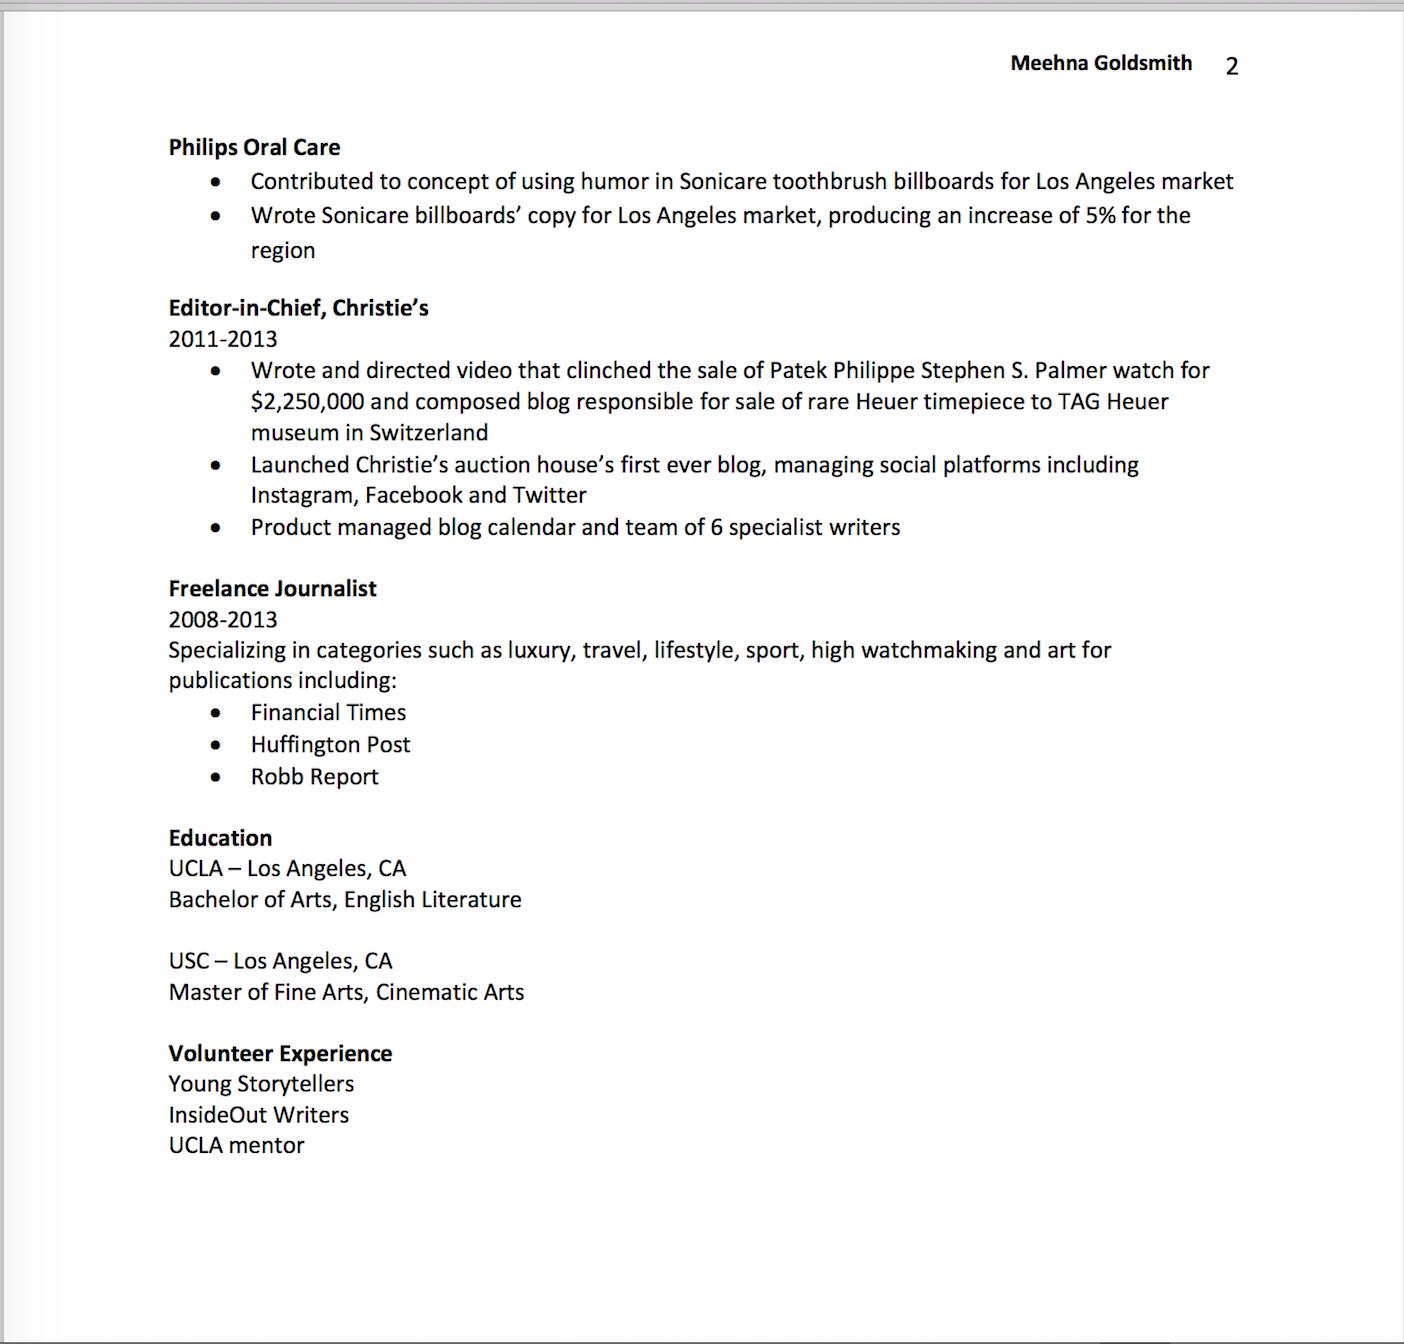 Resume — Meehna Goldsmith